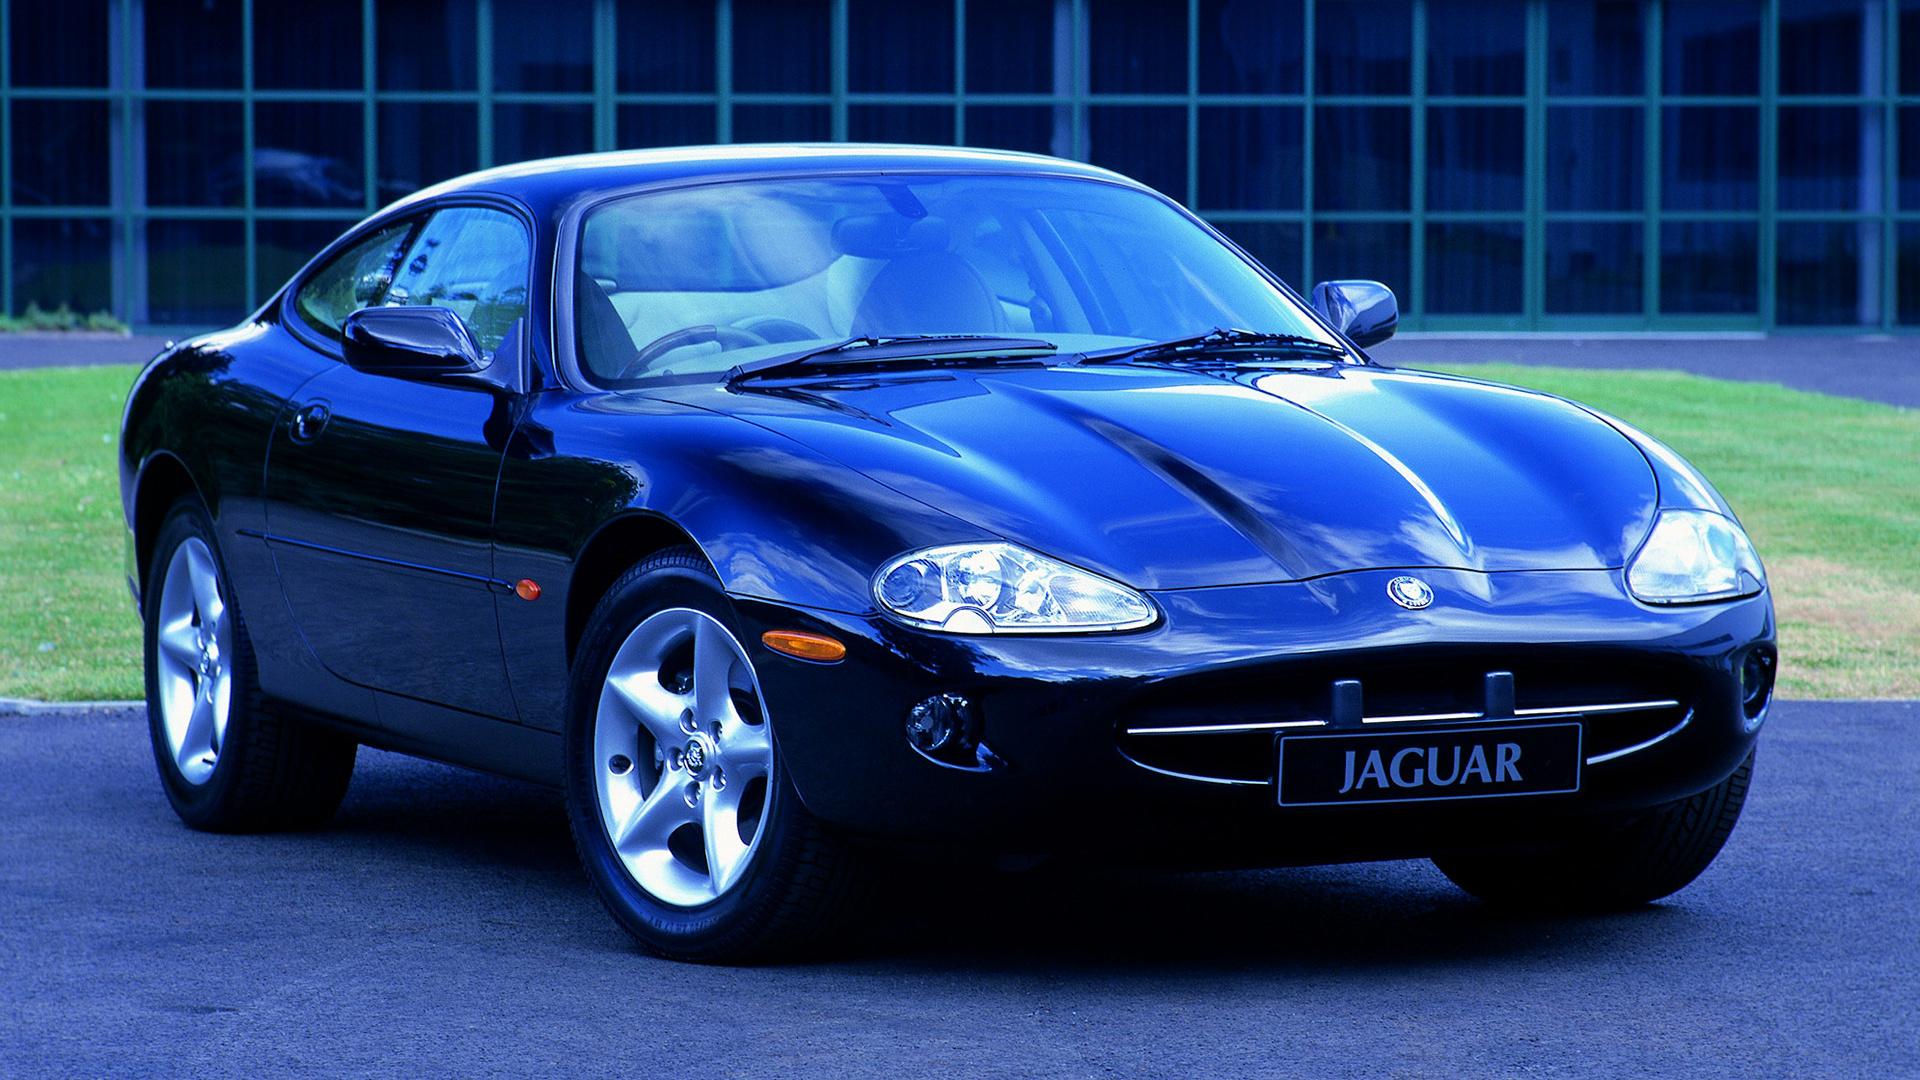 Jaguar Xk8 Coupe 1996 Uk Wallpapers And Hd Images Car